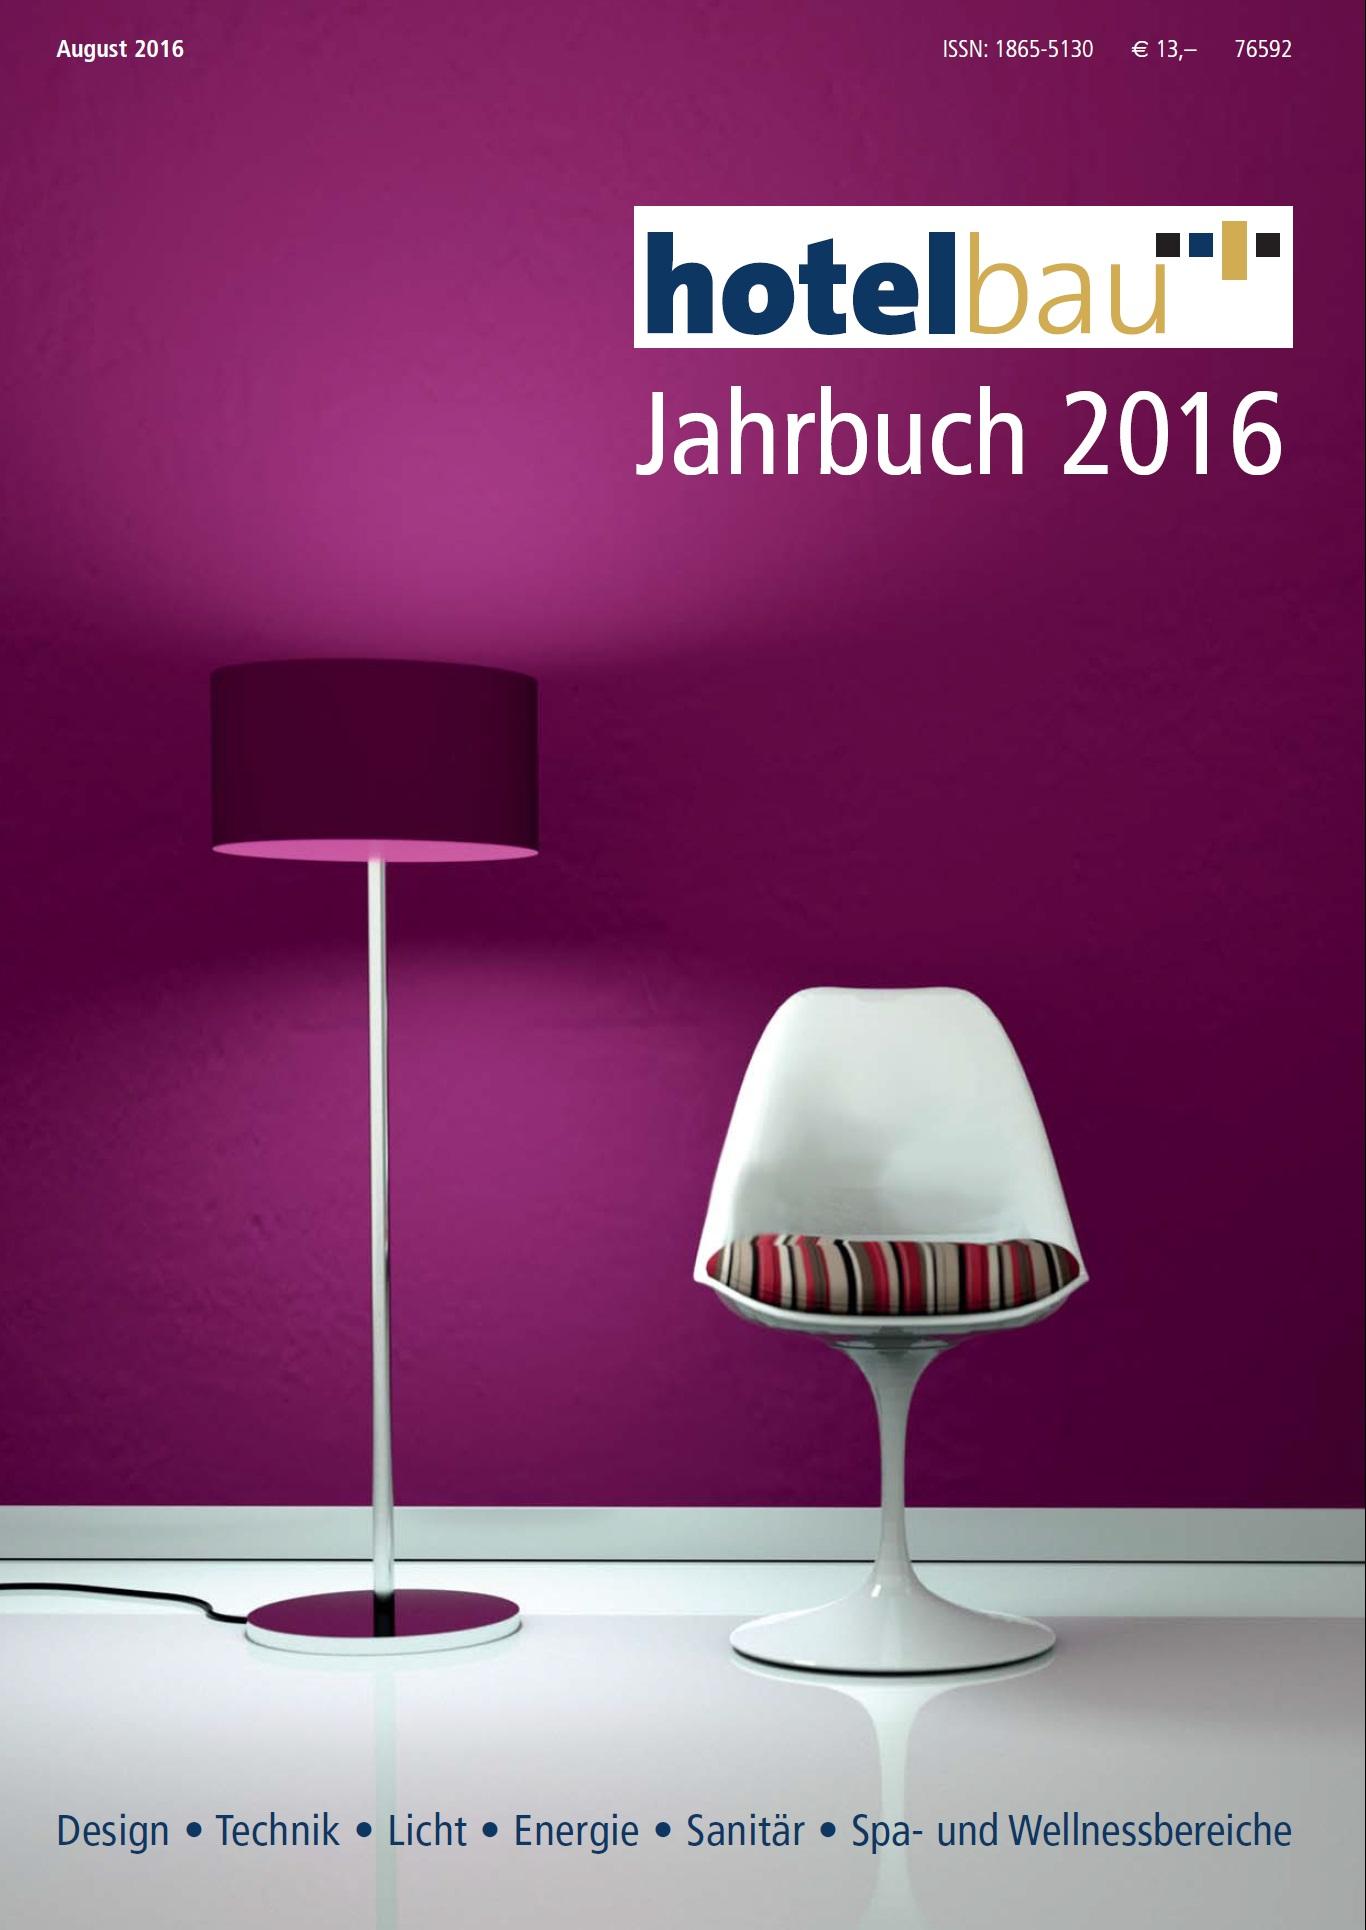 Hotelbau Jahrbuch 2016 (Zip)